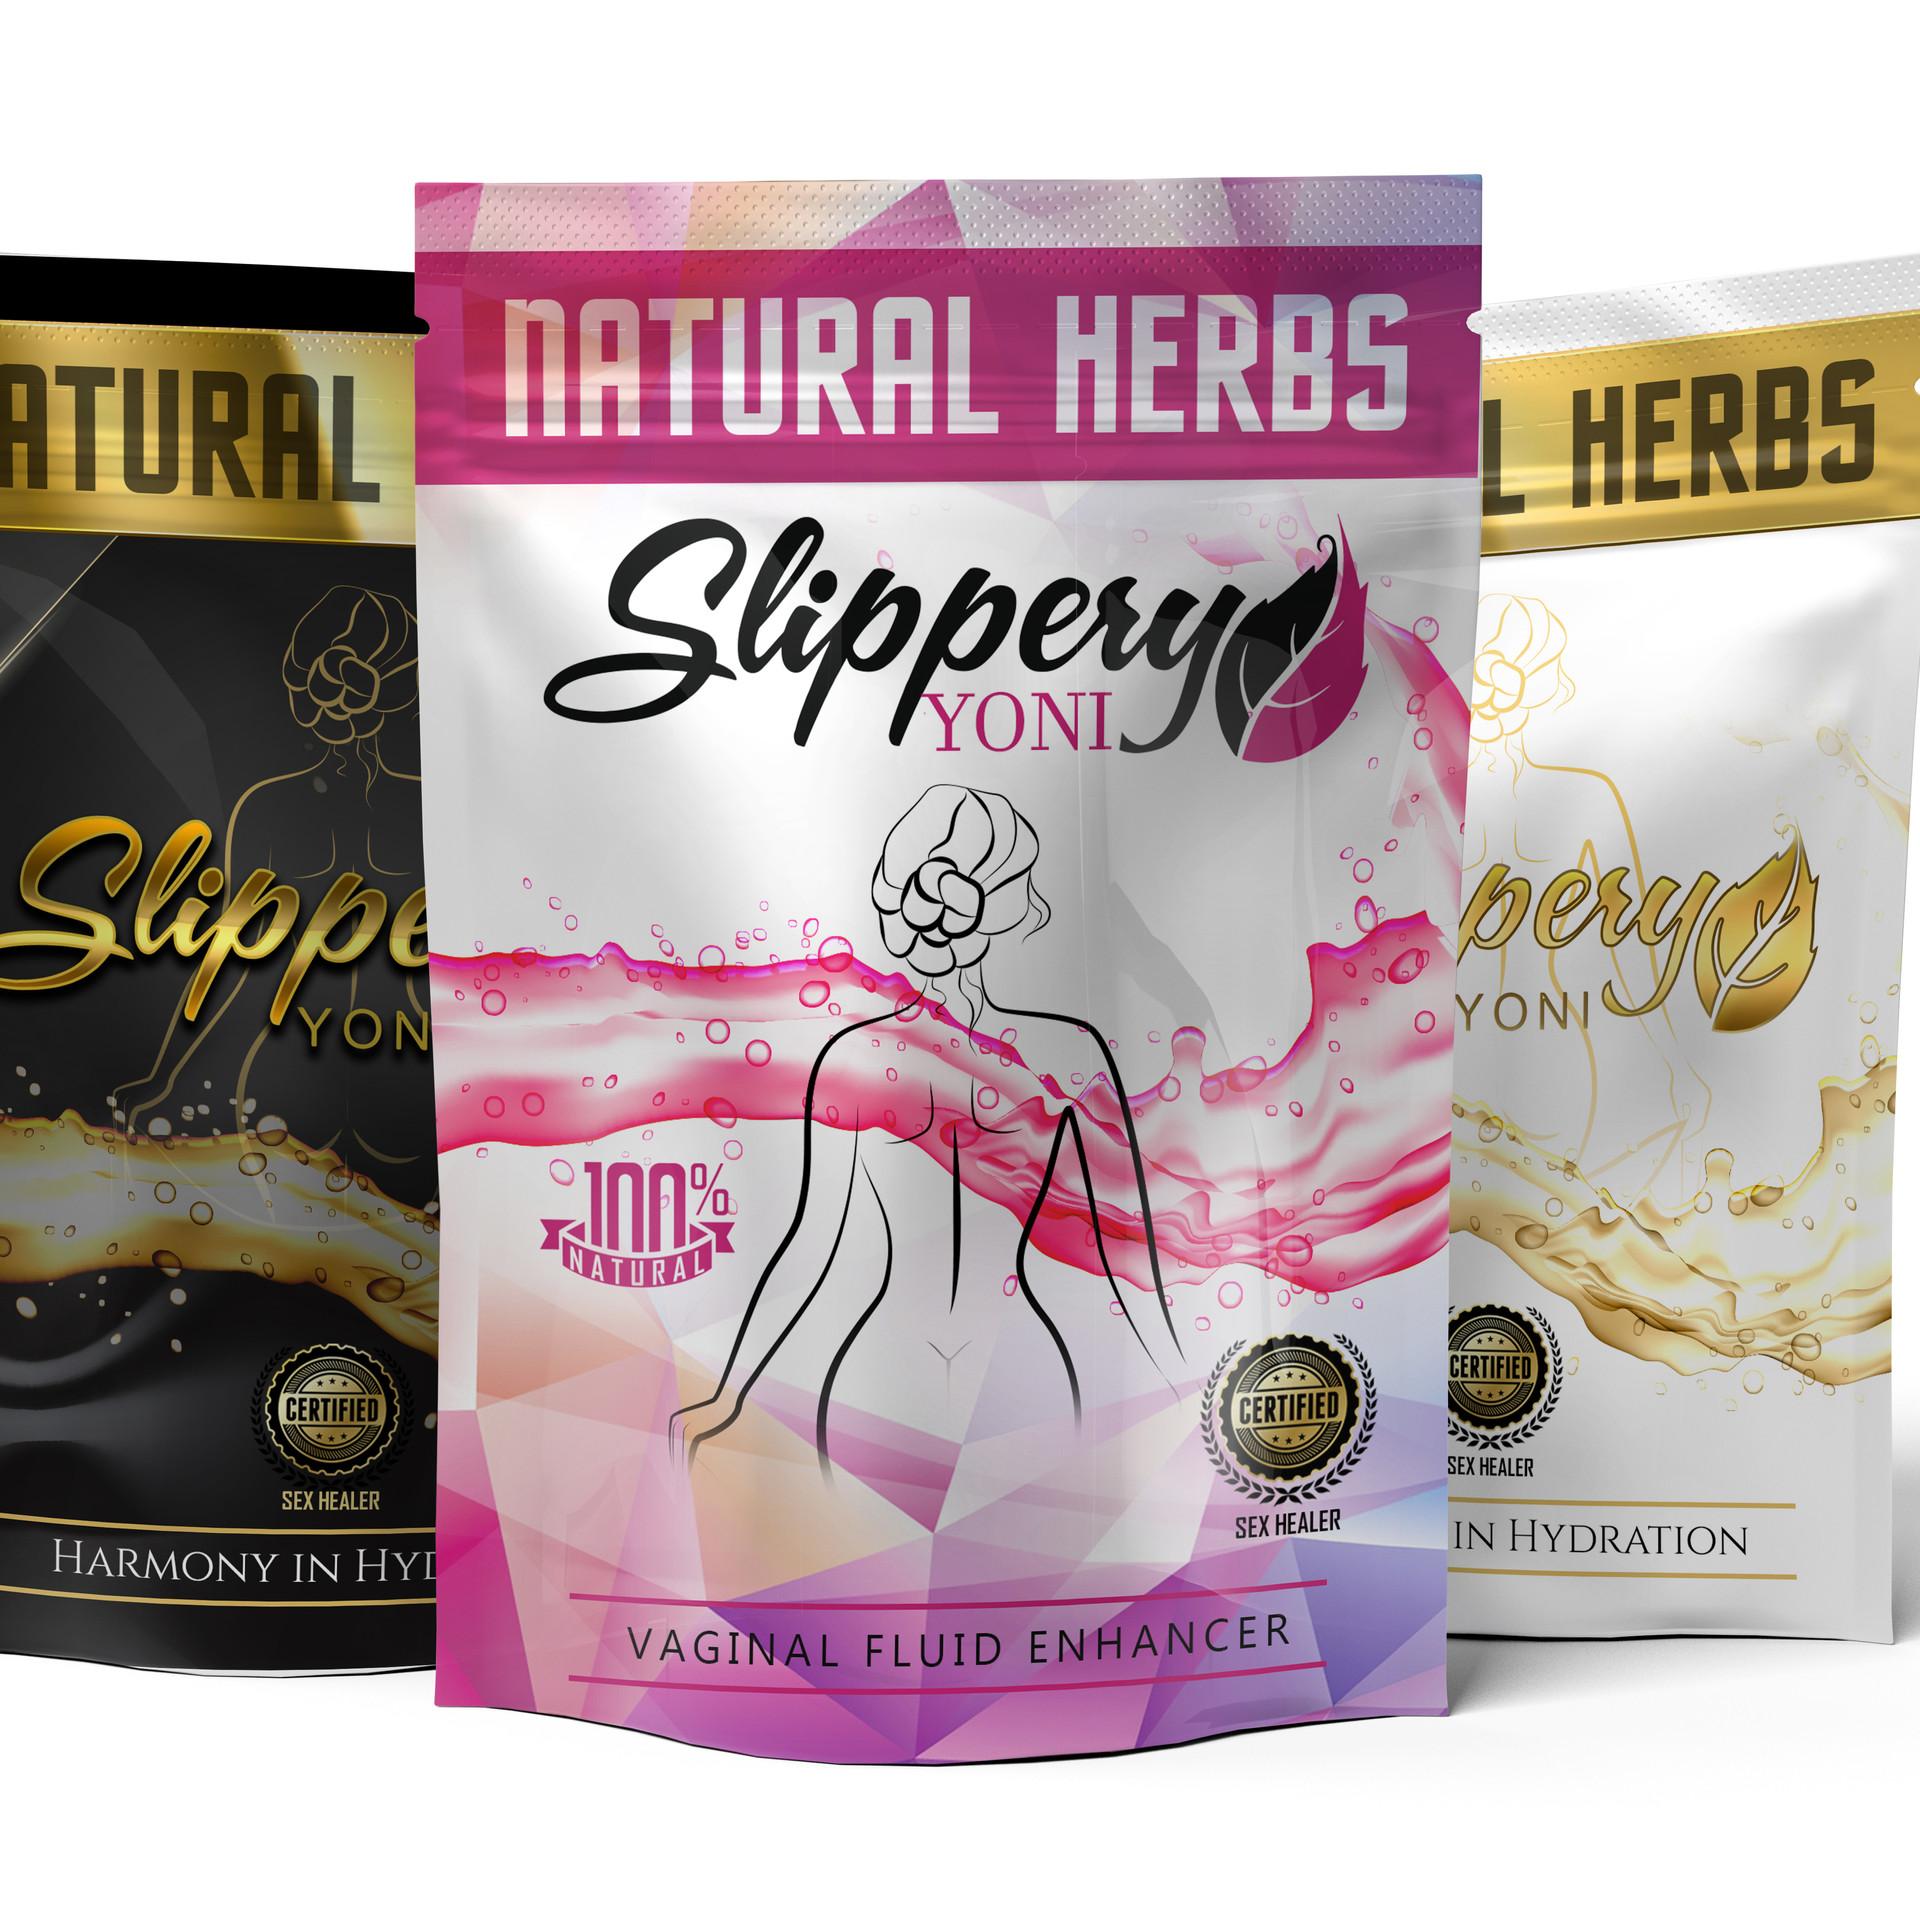 Slippery Yoni - Herbal Tea Package Design